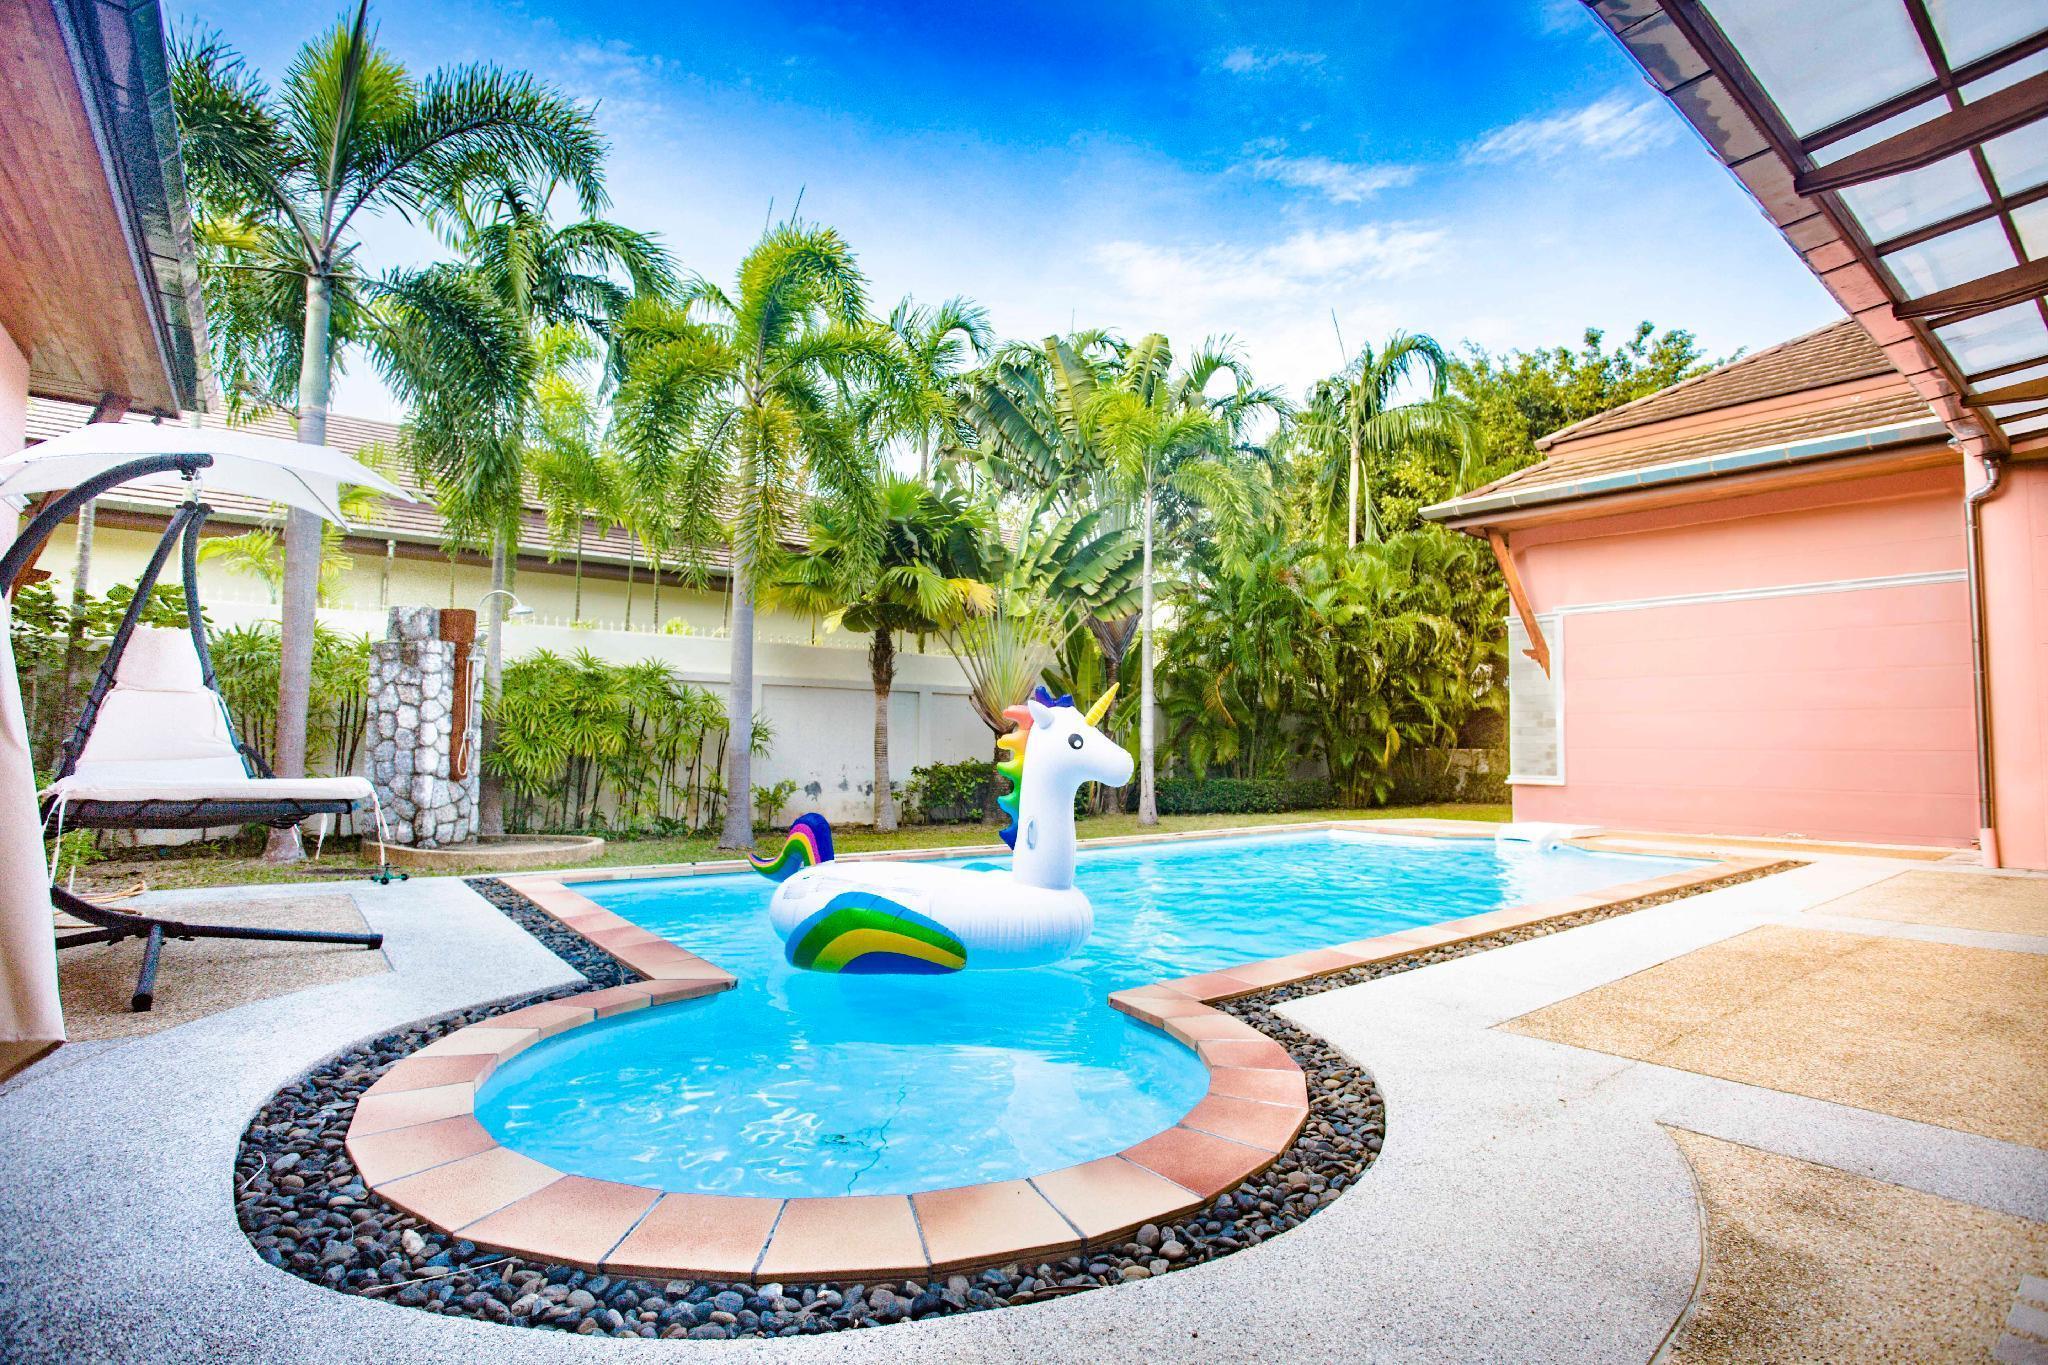 Moonrise Villa Phuket, budget private pool villa